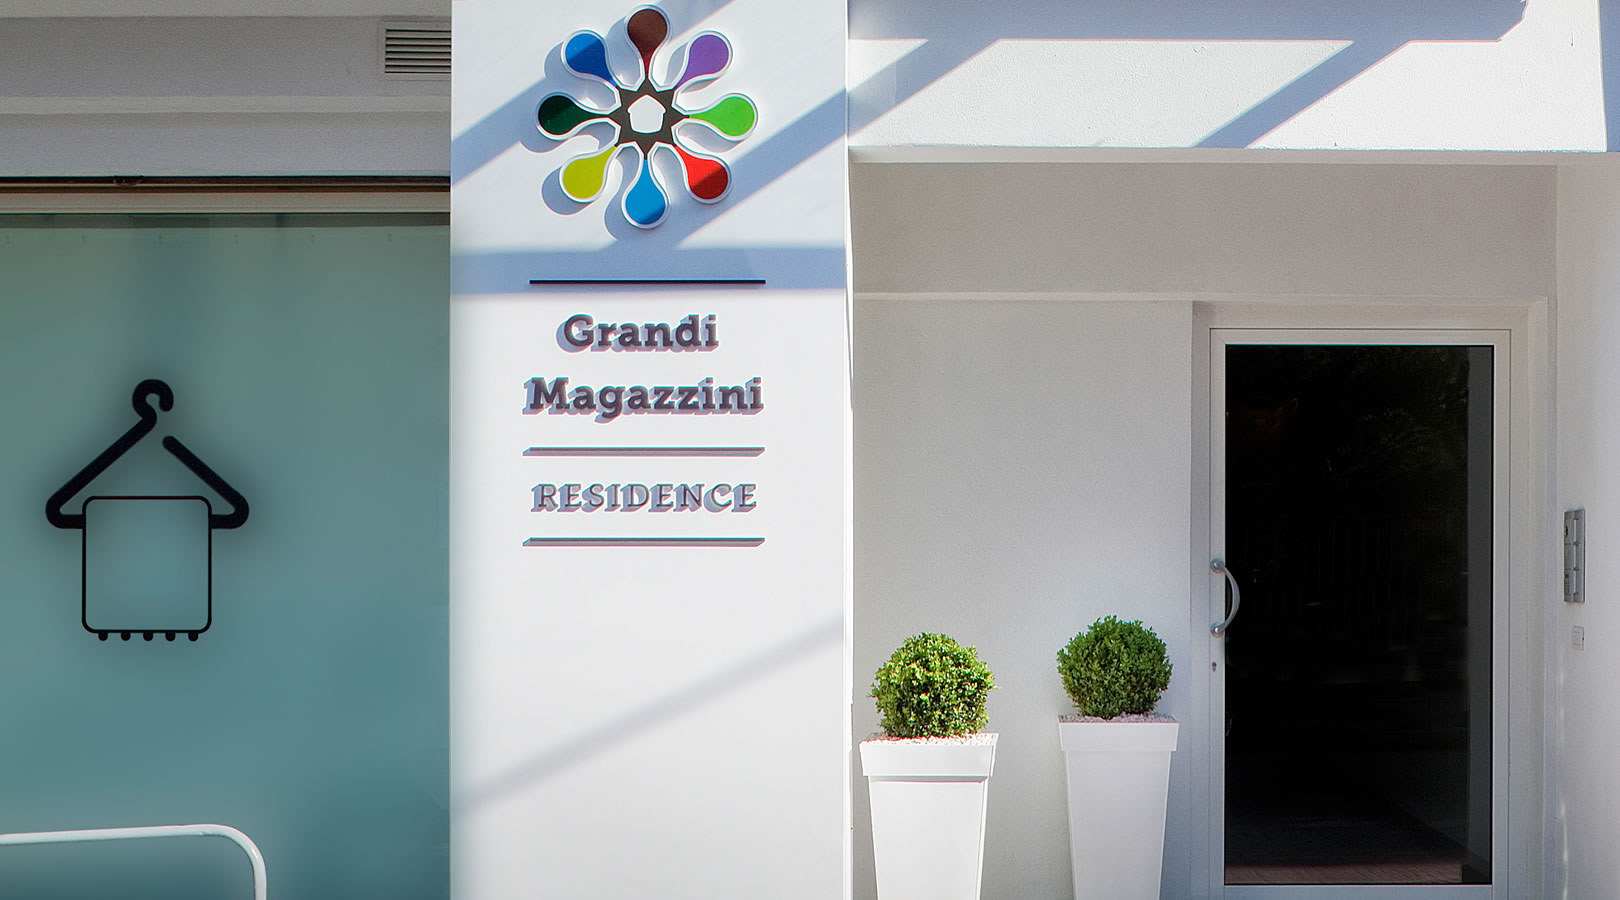 gruppo-felix-hotels-grandi-magazzini-nuoro-sardegna13